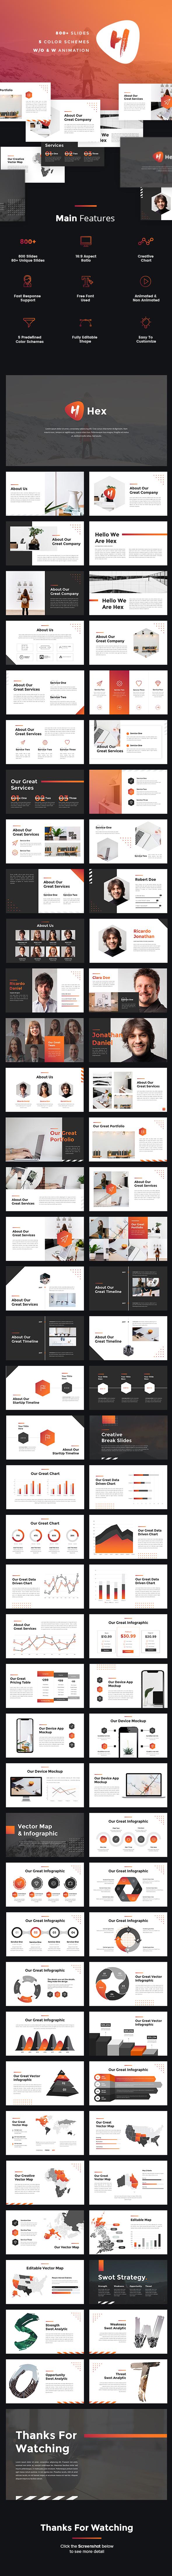 hex - startup pitch deck powerpoint templatesuavedigital, Powerpoint templates